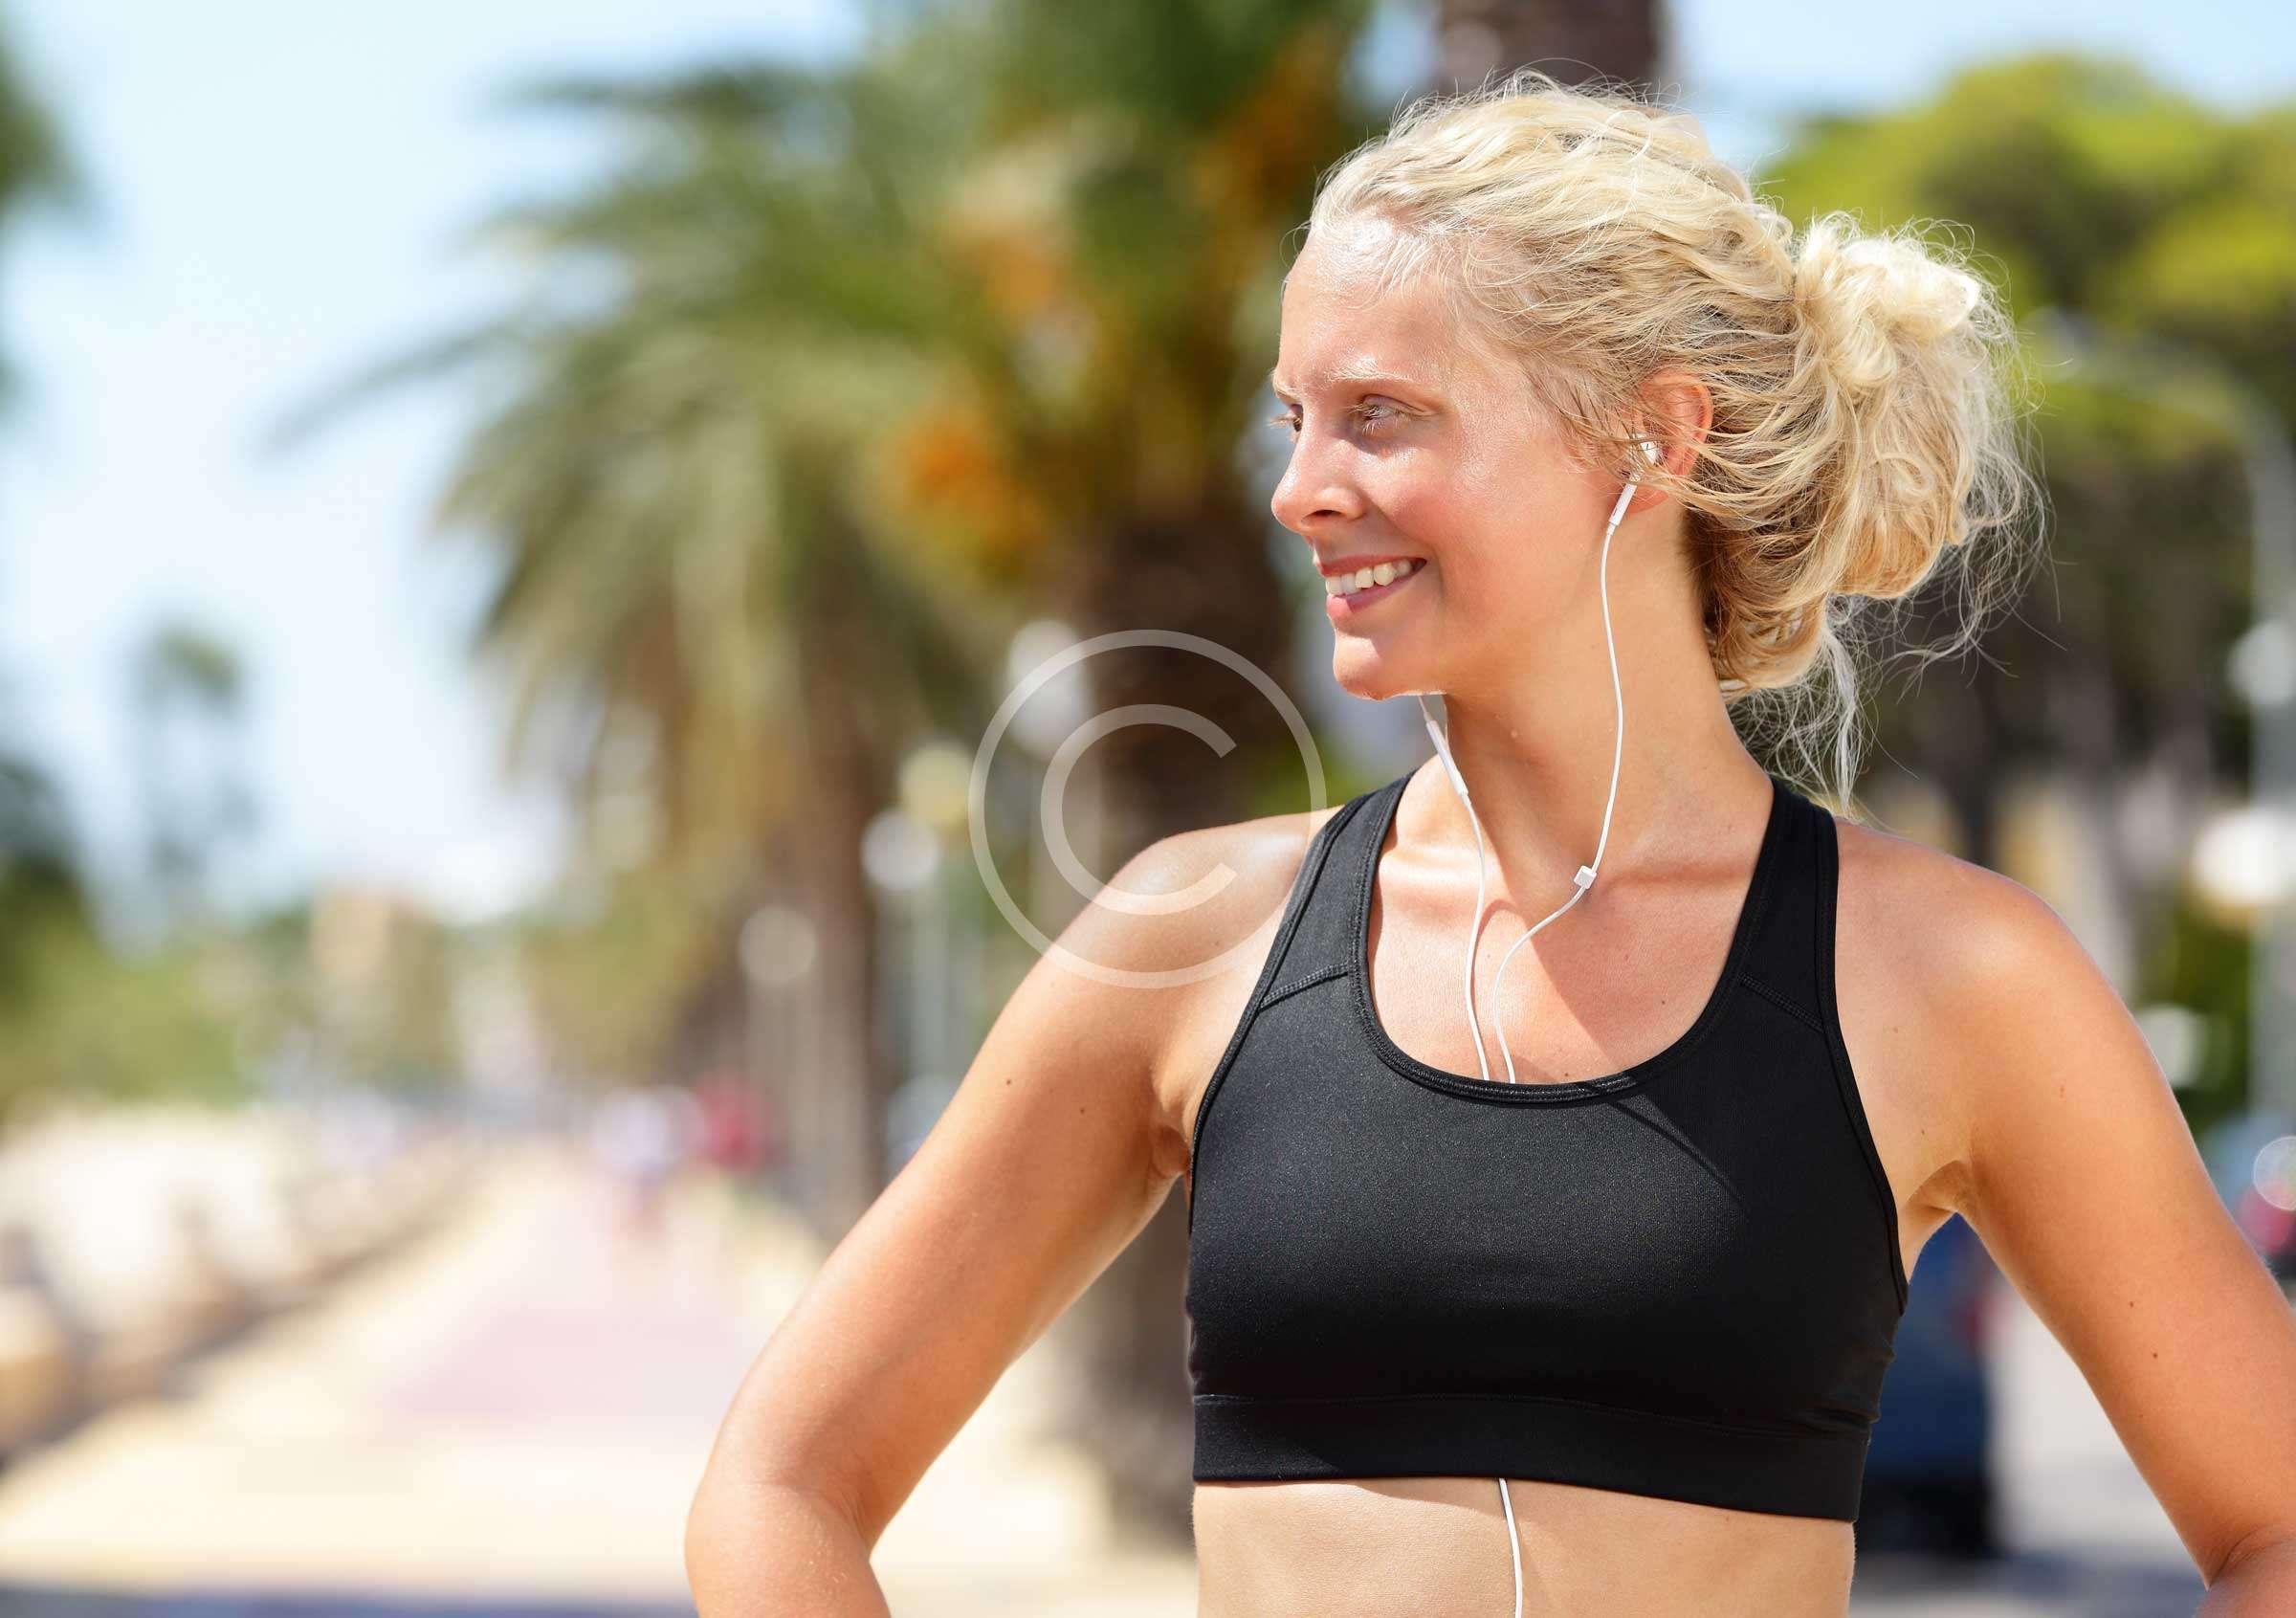 Build Positive Attitude by Living Healthy